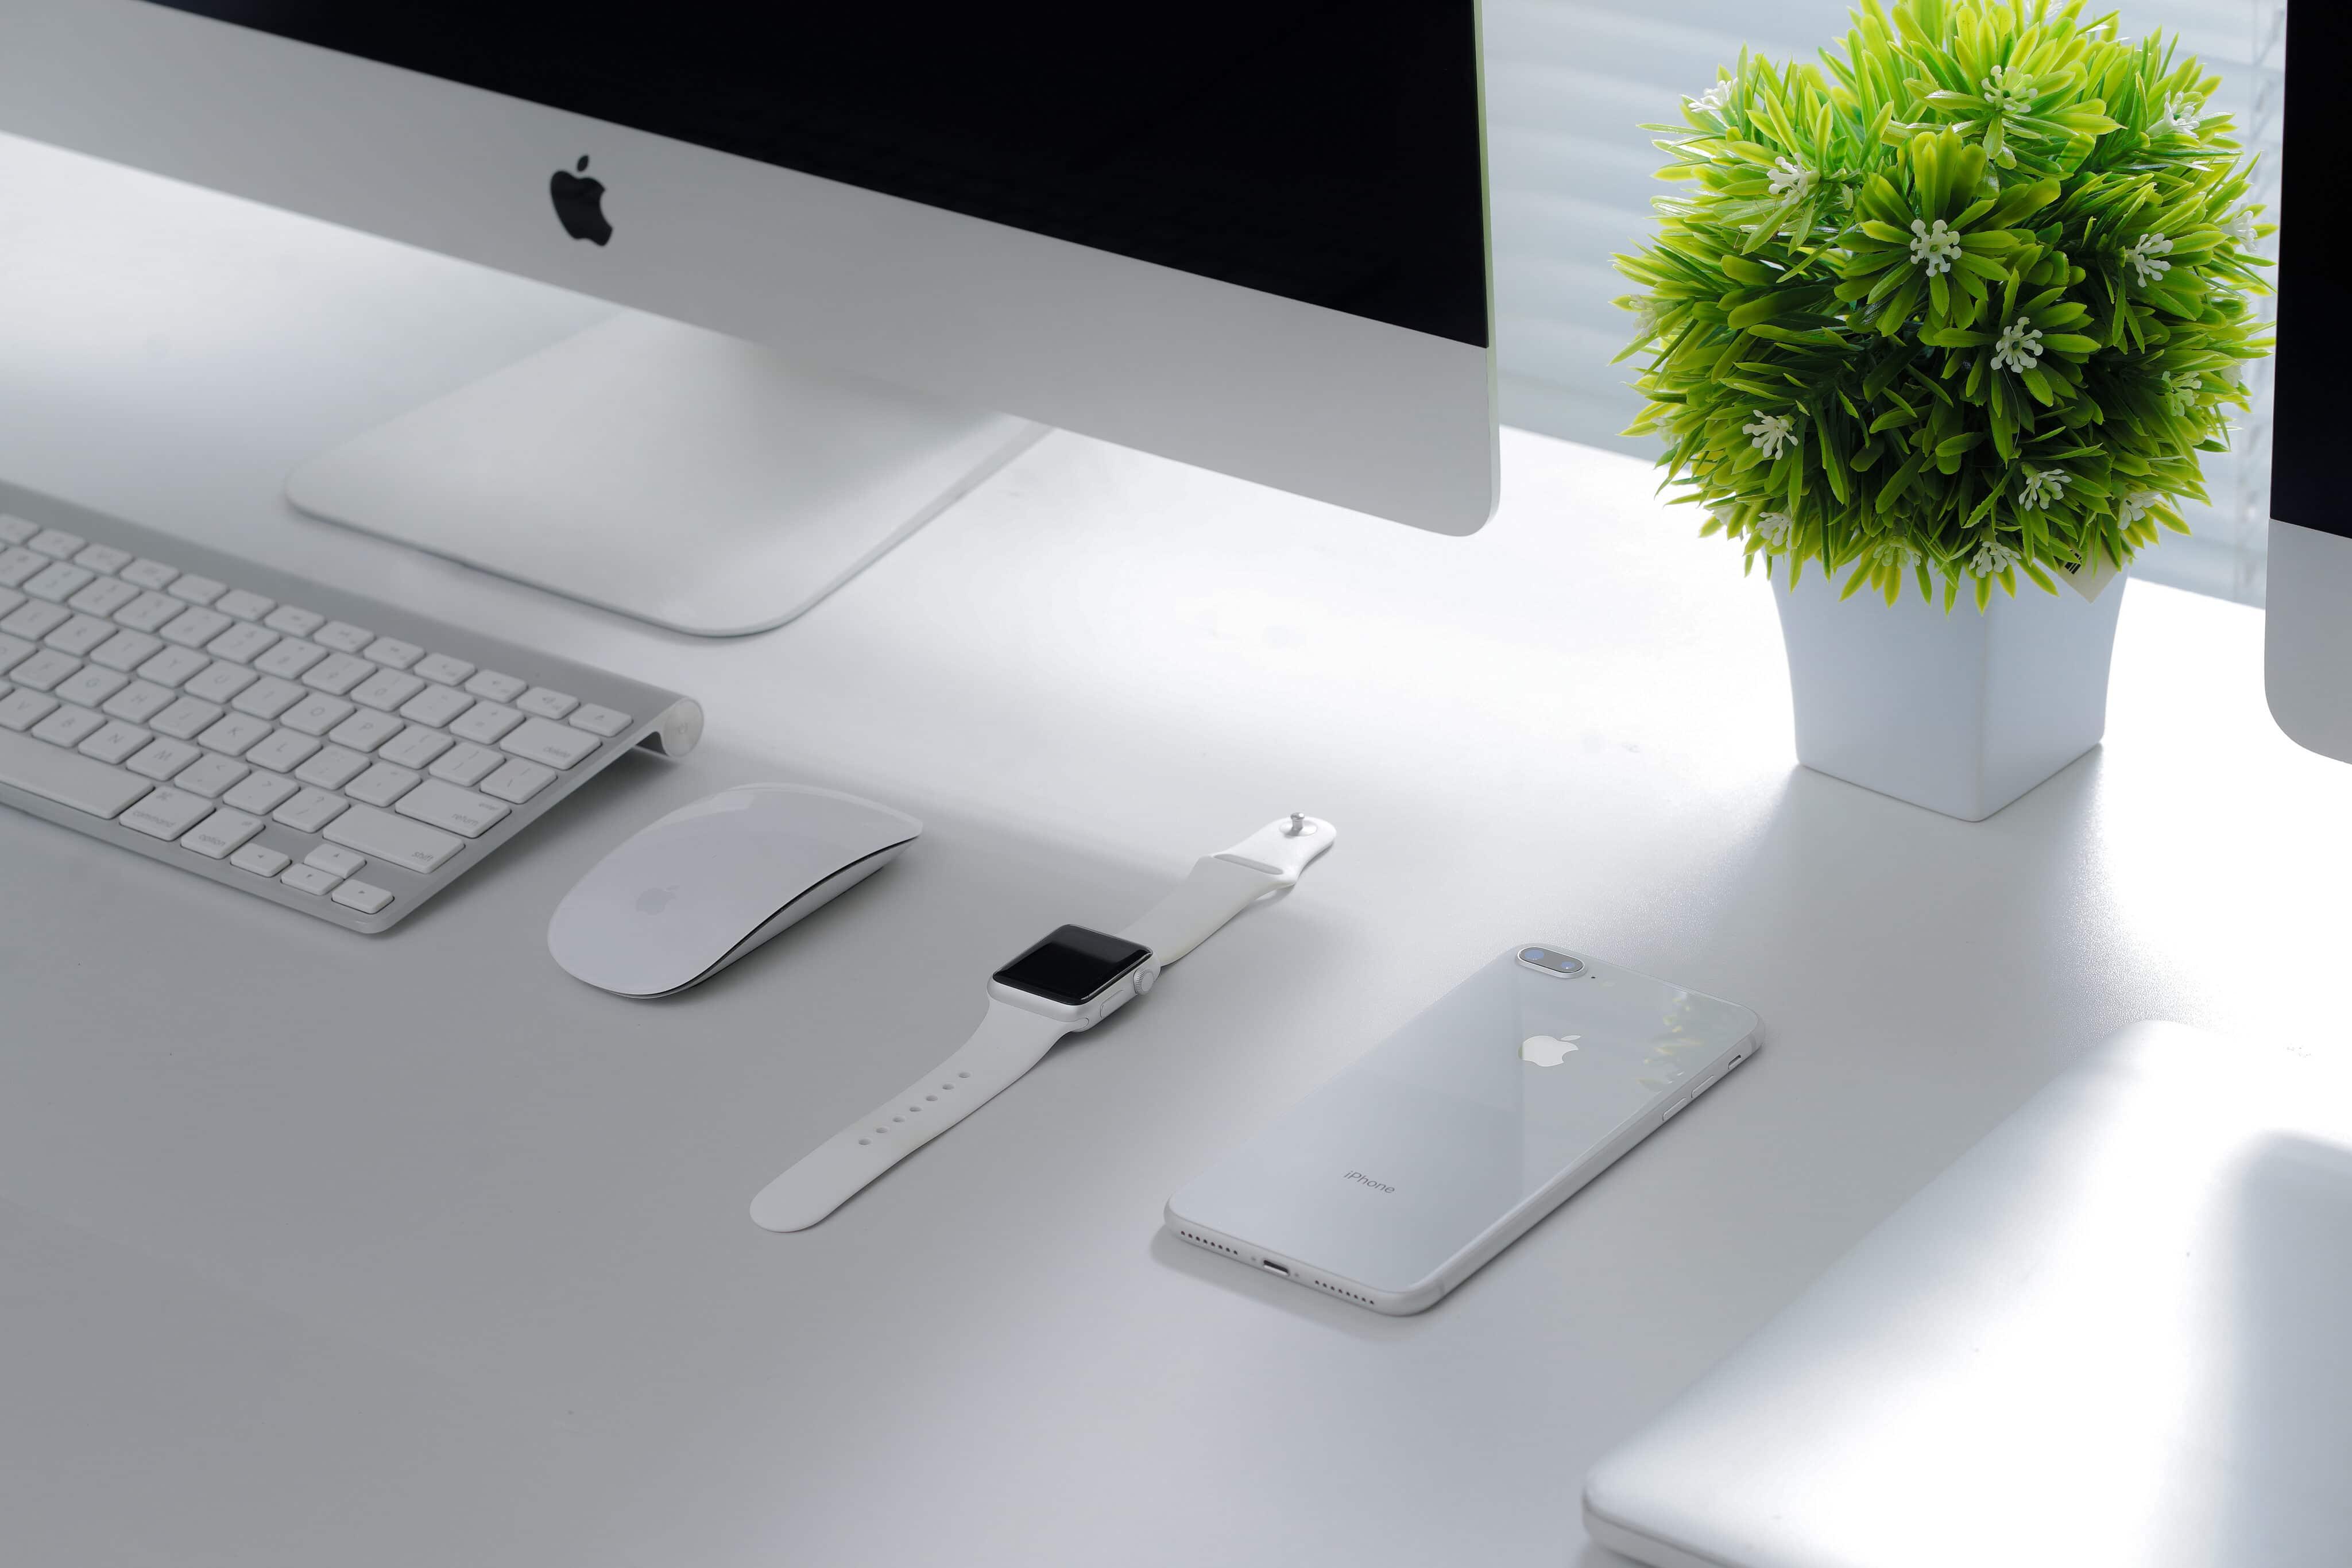 iMac, Magic Mouse, Apple Watch, iPhone 8 e MacBook Air numa mesa branca